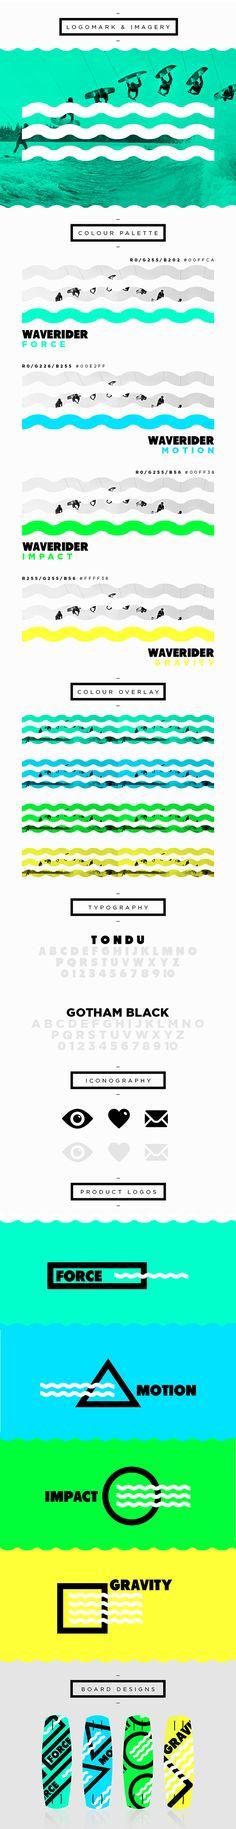 WAVERIDER // Branding | Designer: Jonathan Quintin